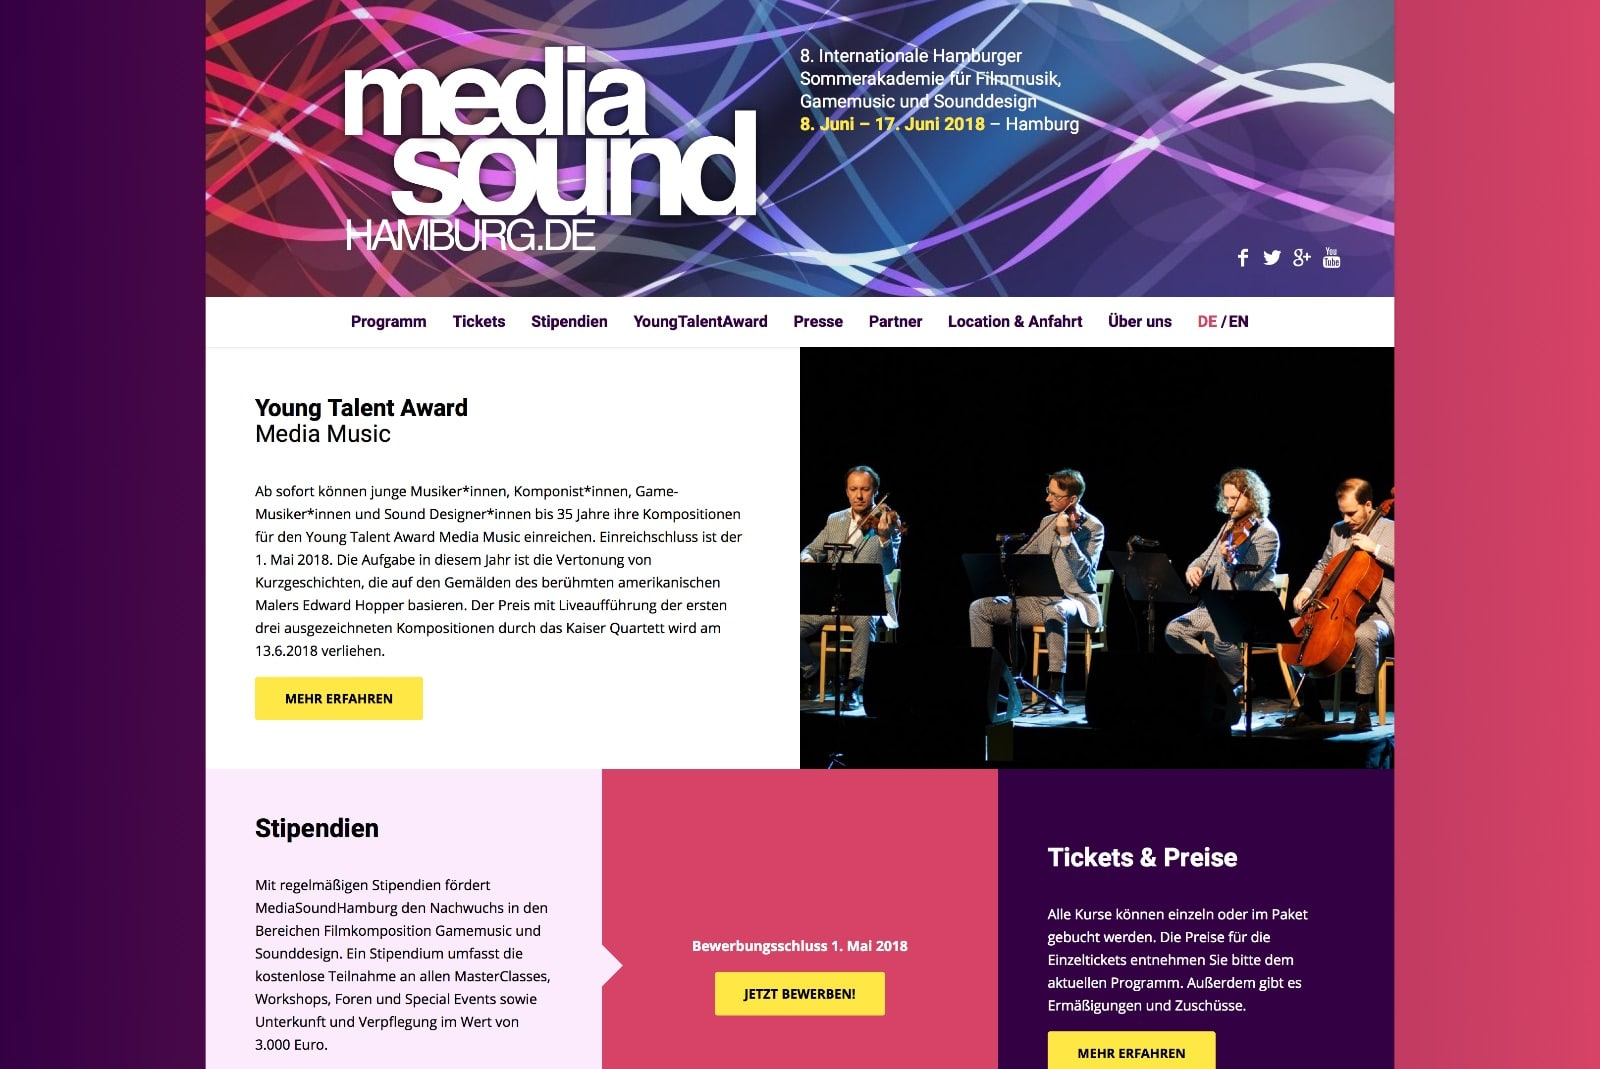 MediaSoundHamburg Startseite